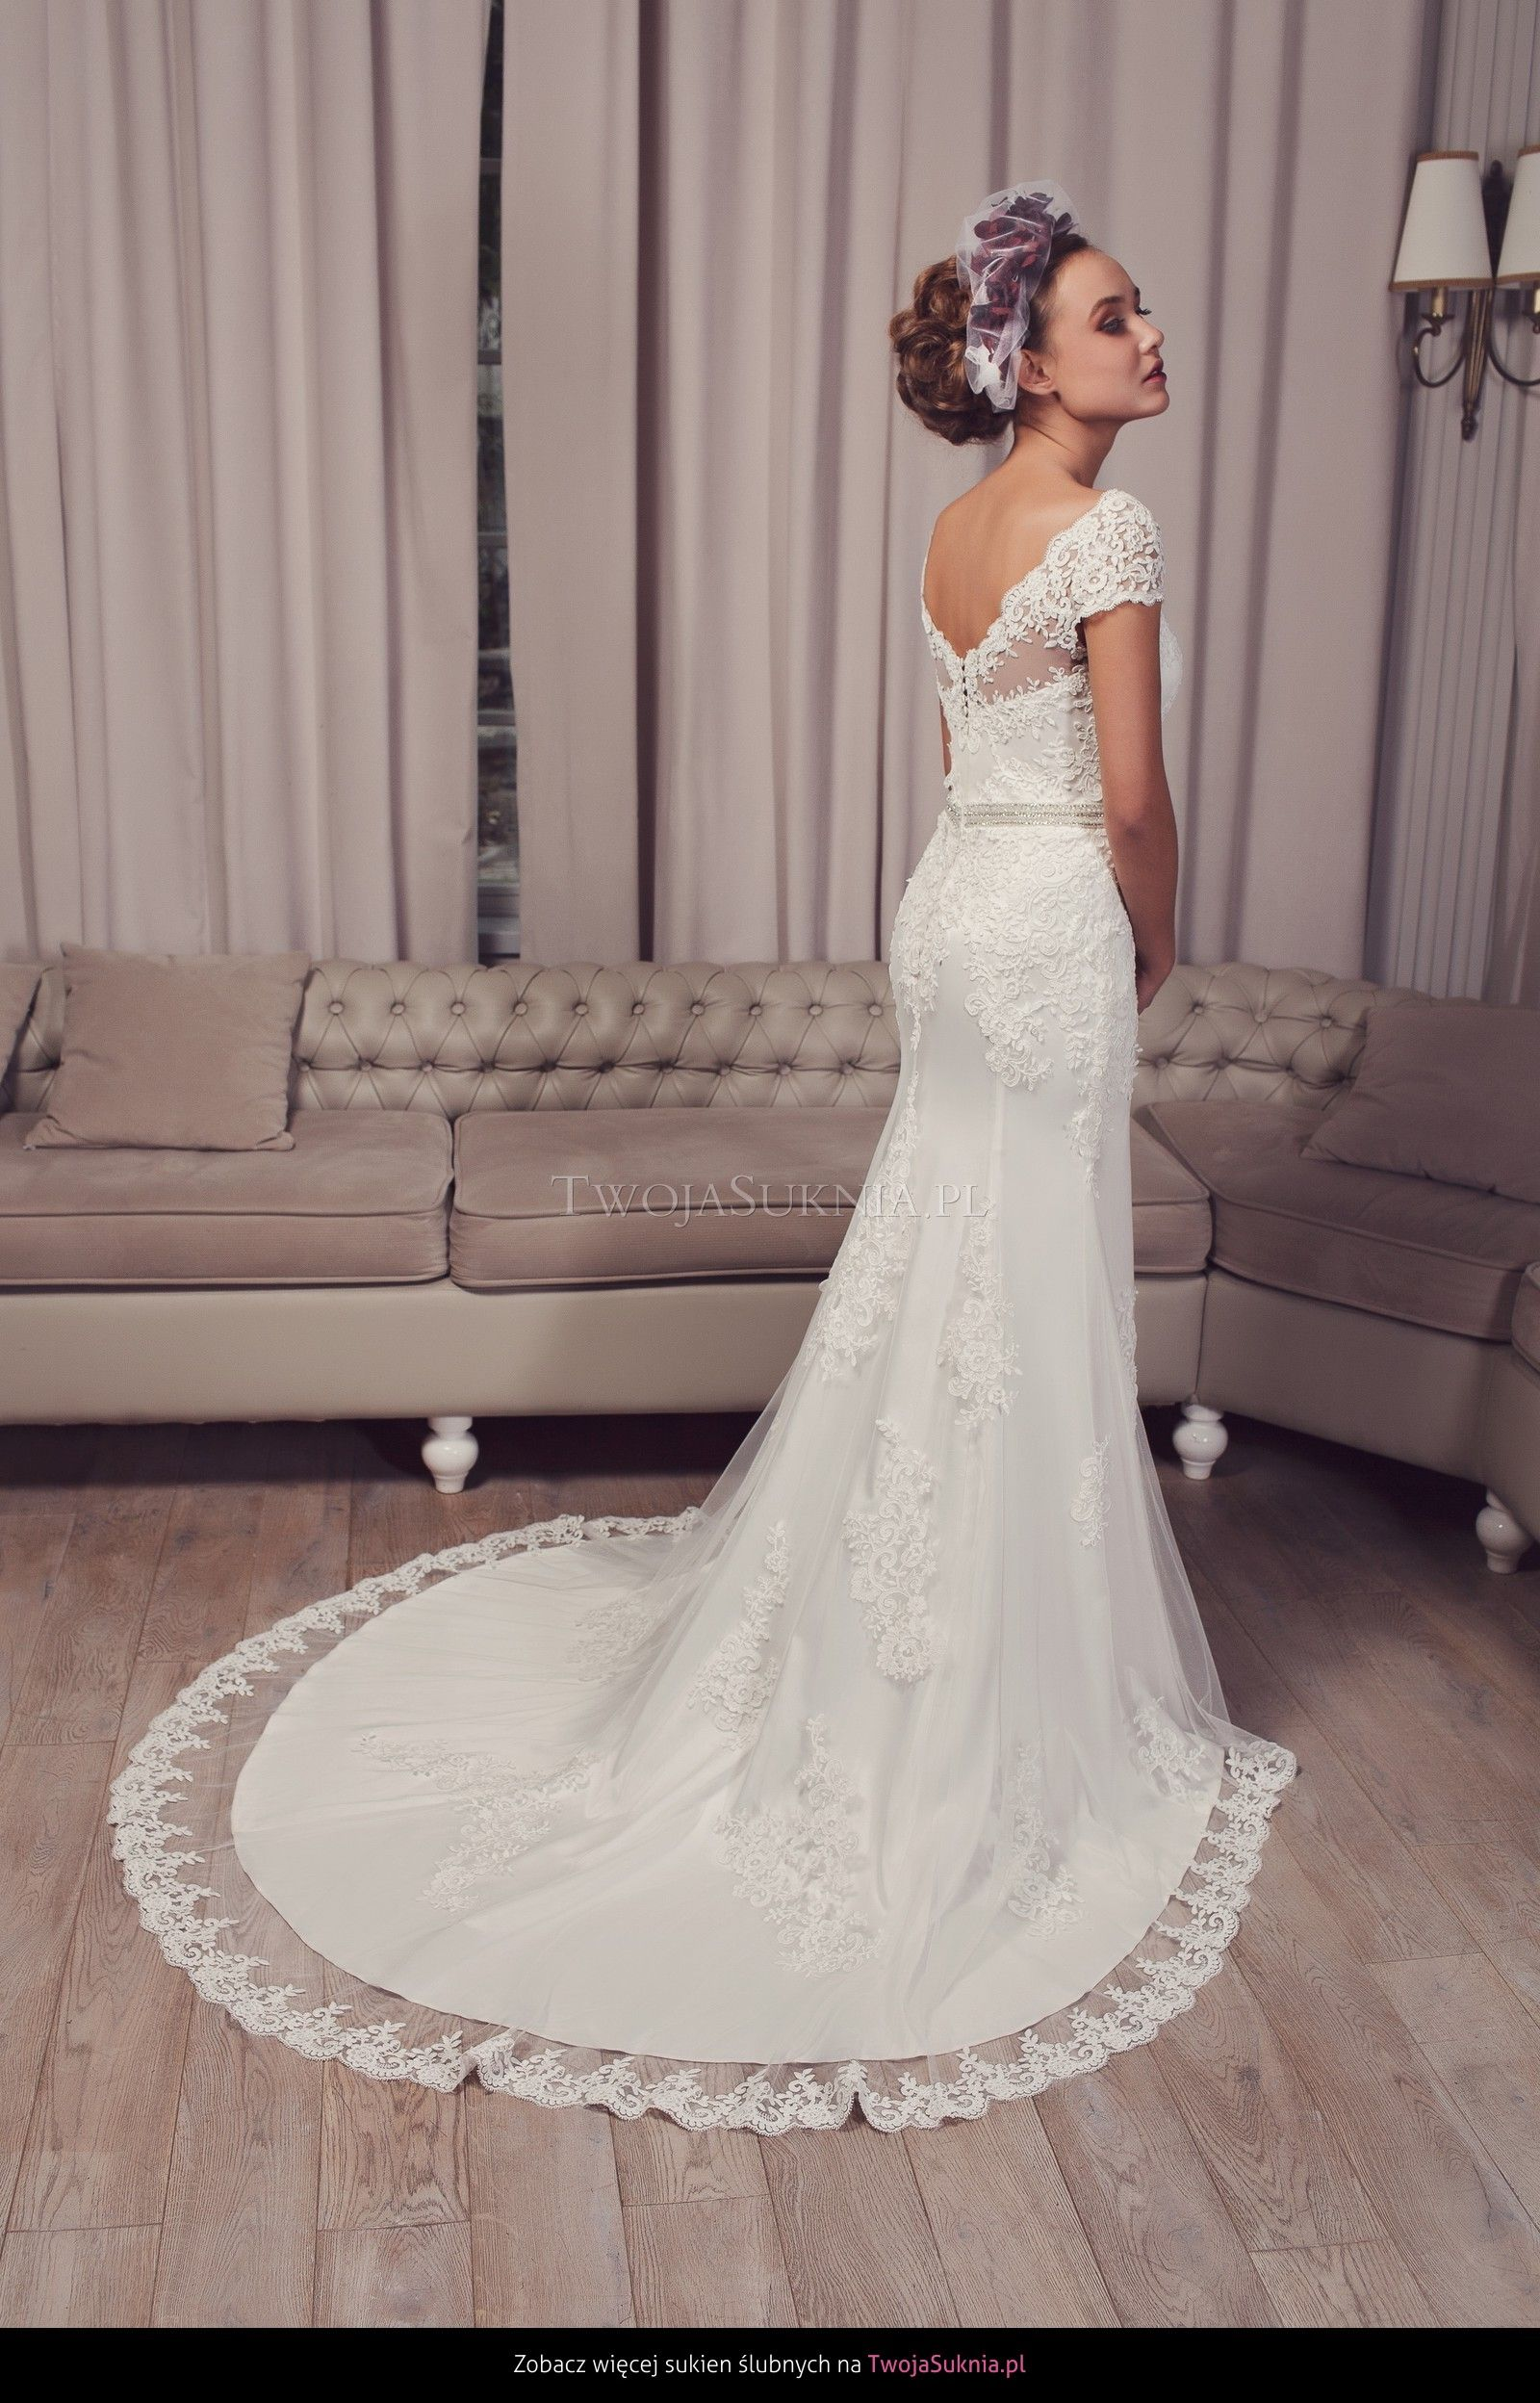 Gellena 1103 Charlotte 2016 Wedding Dresses Dresses Sheath Wedding Dress